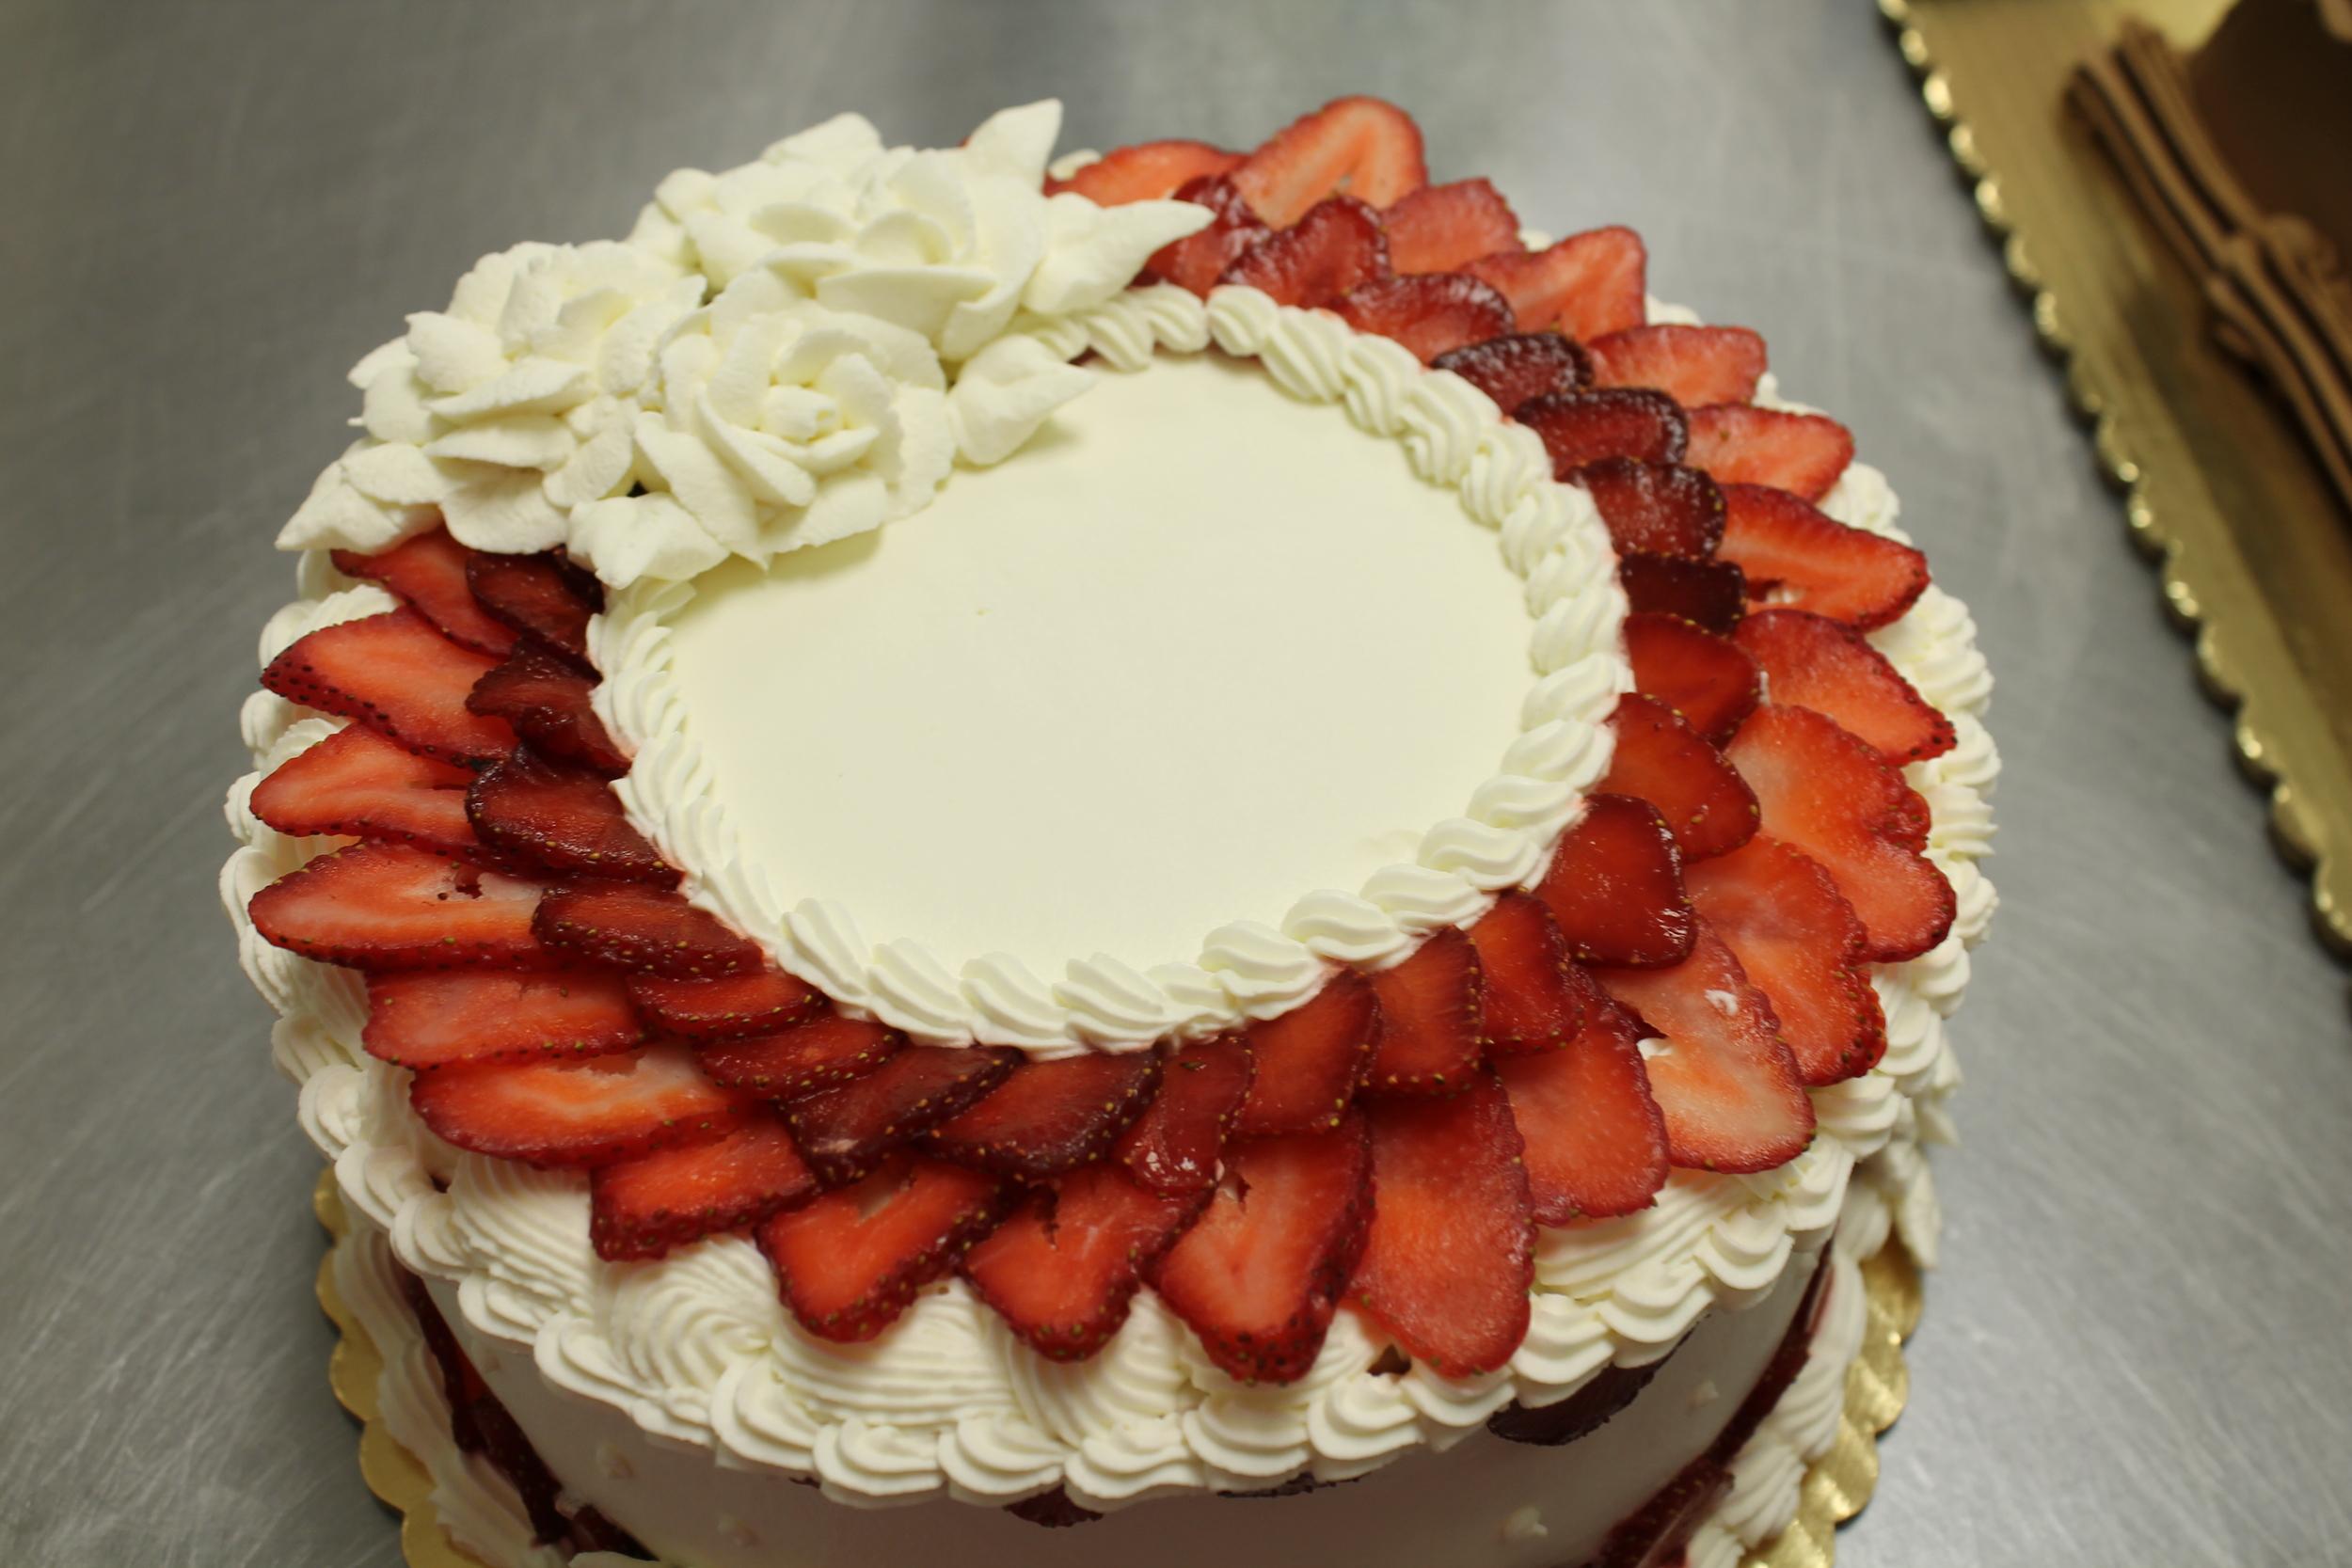 Exquisite Strawberry Shortcake